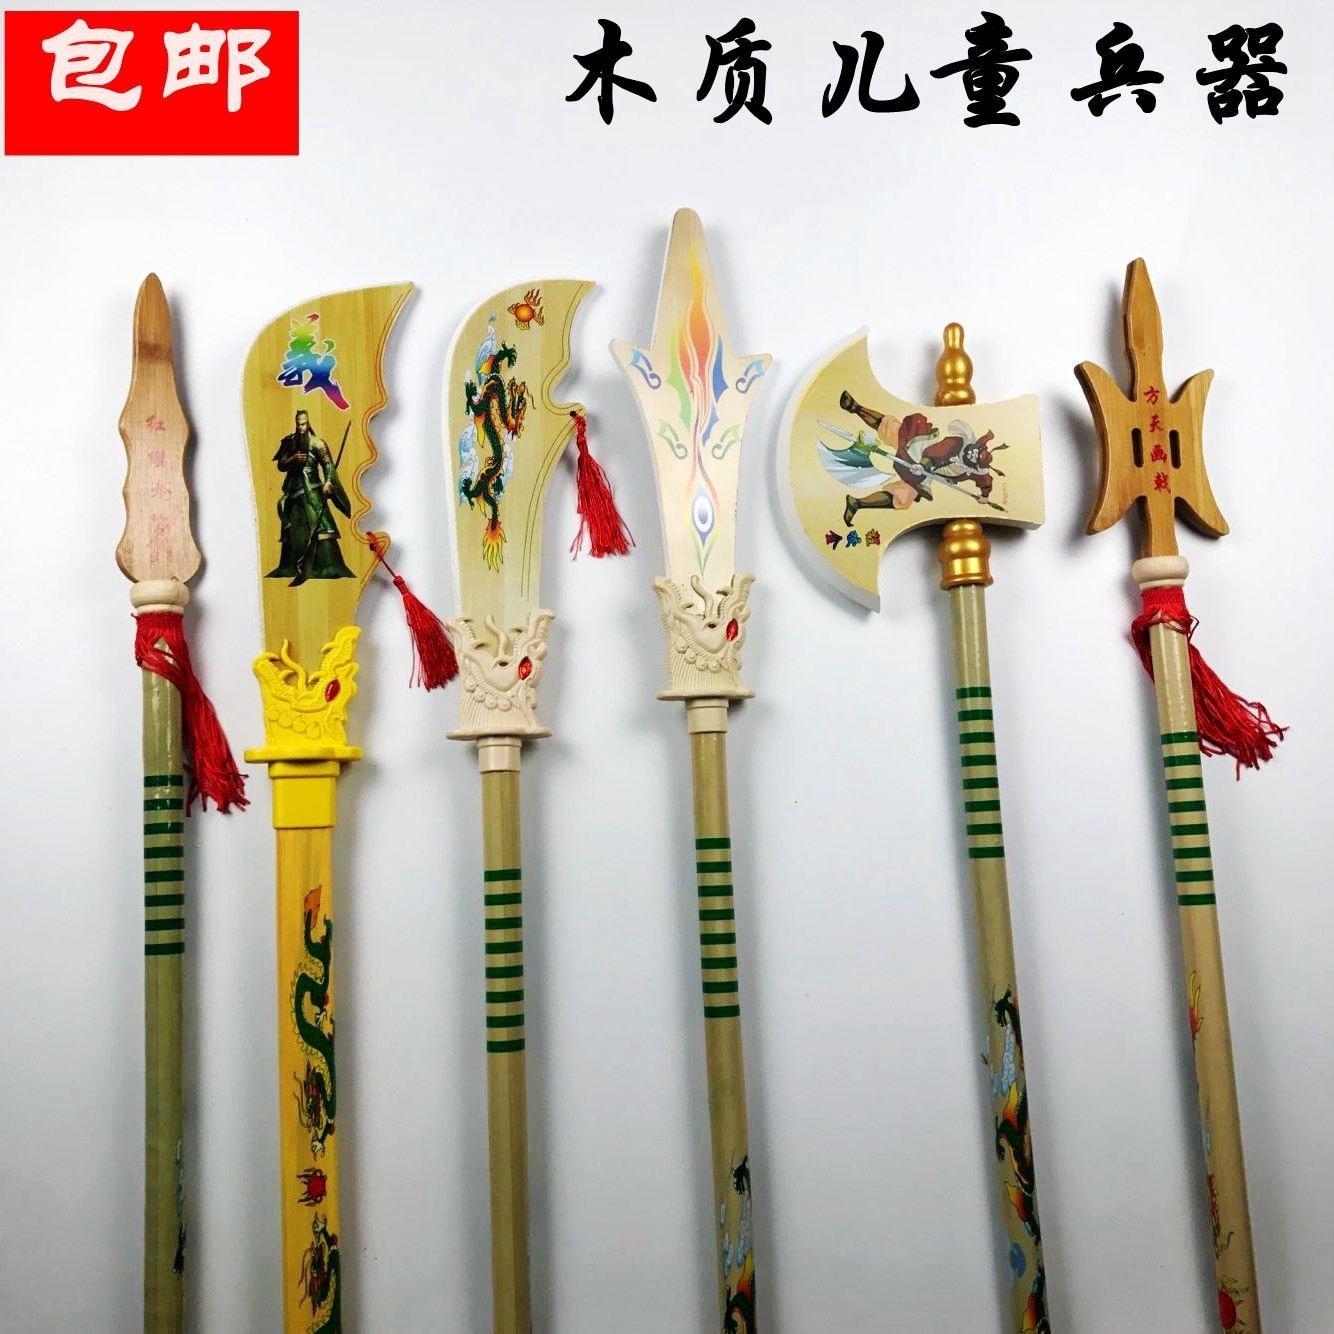 Beijing Opera Red-Tasselled Spear Dance Props Icing Gun Children's Stage Martial Arts Toys Long Gun Long Spear Three Kingdoms